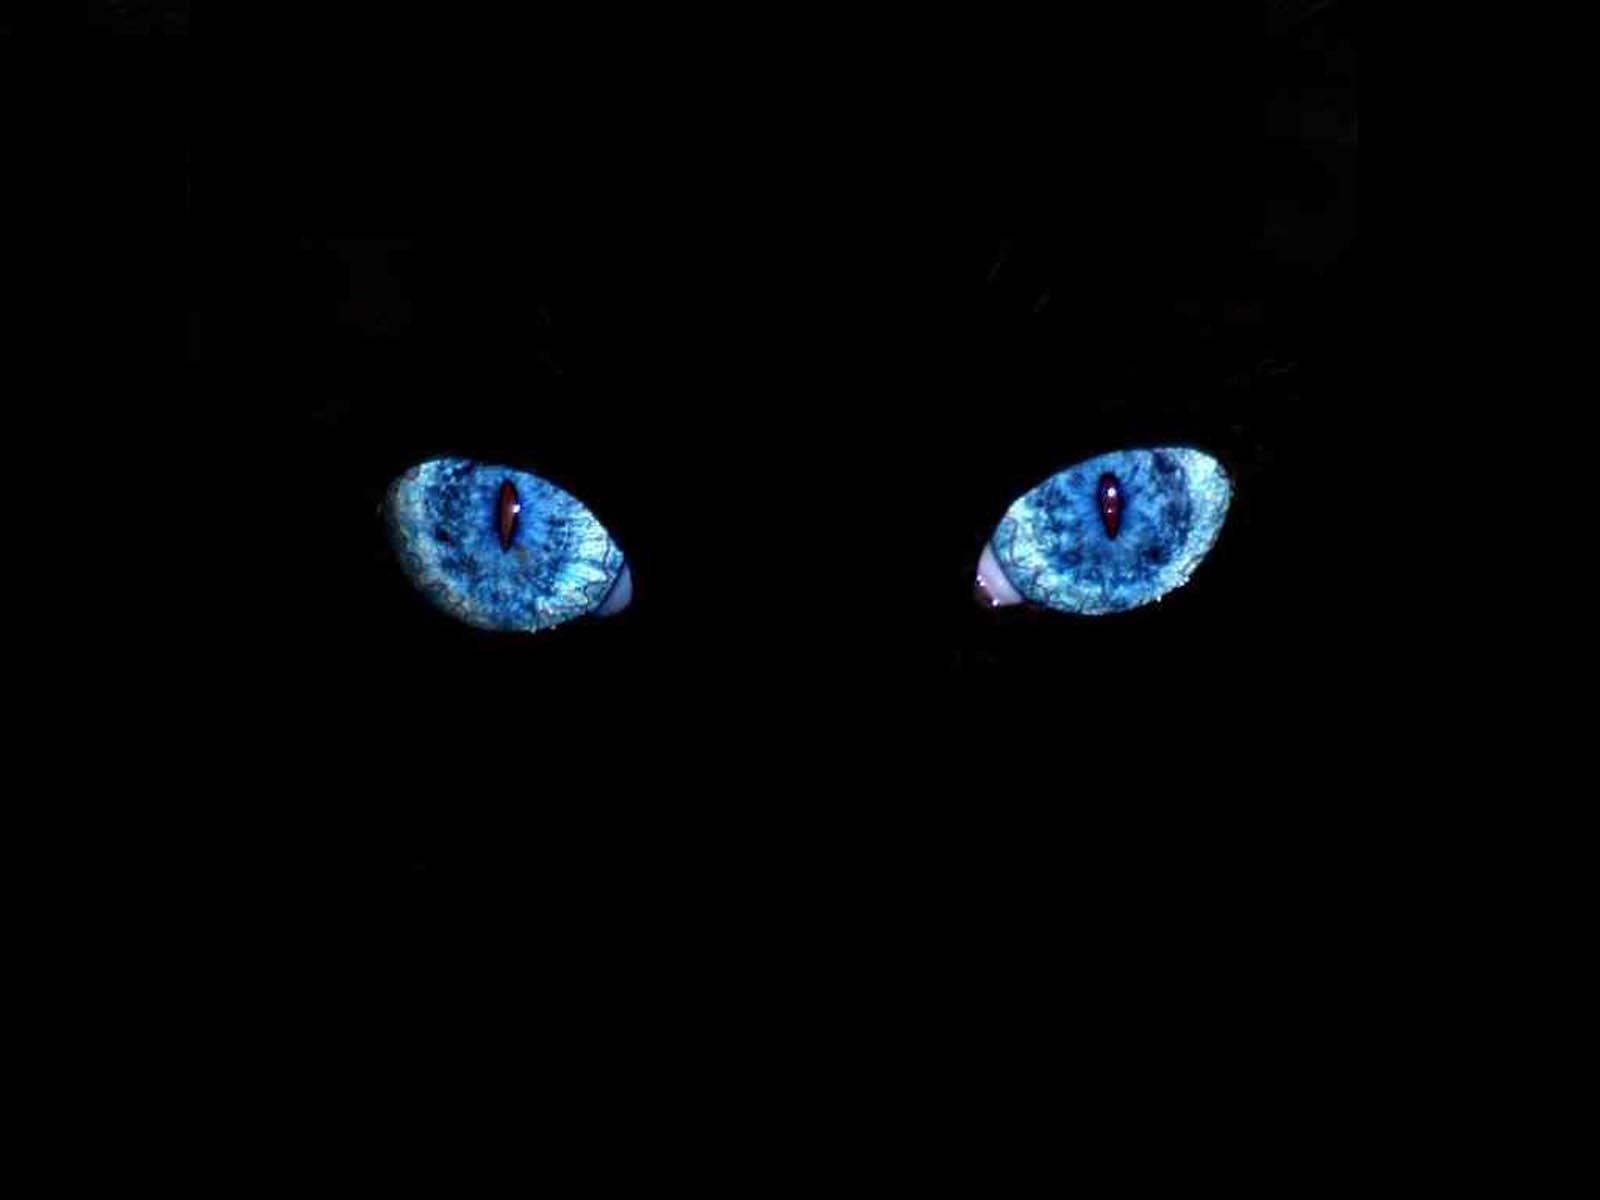 wallpapers black cat blue eyes